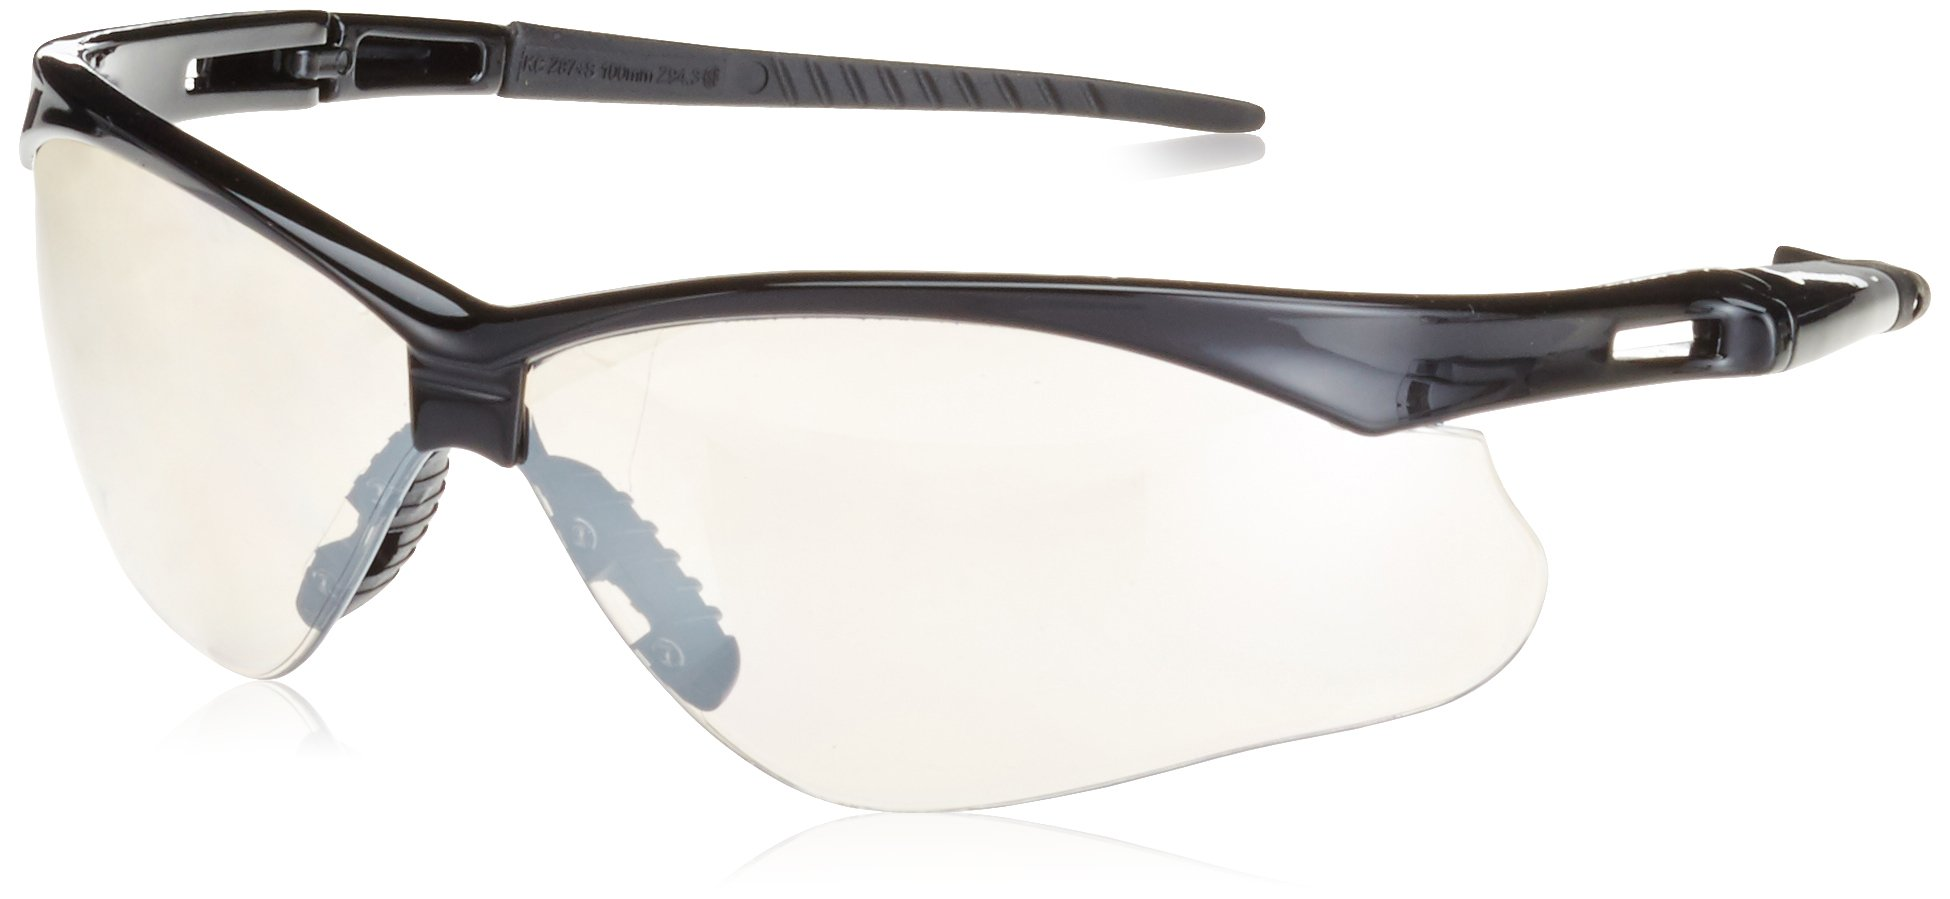 Jackson Indoor/Outdoor Safety Glasses, Scratch-Resistant, Wraparound